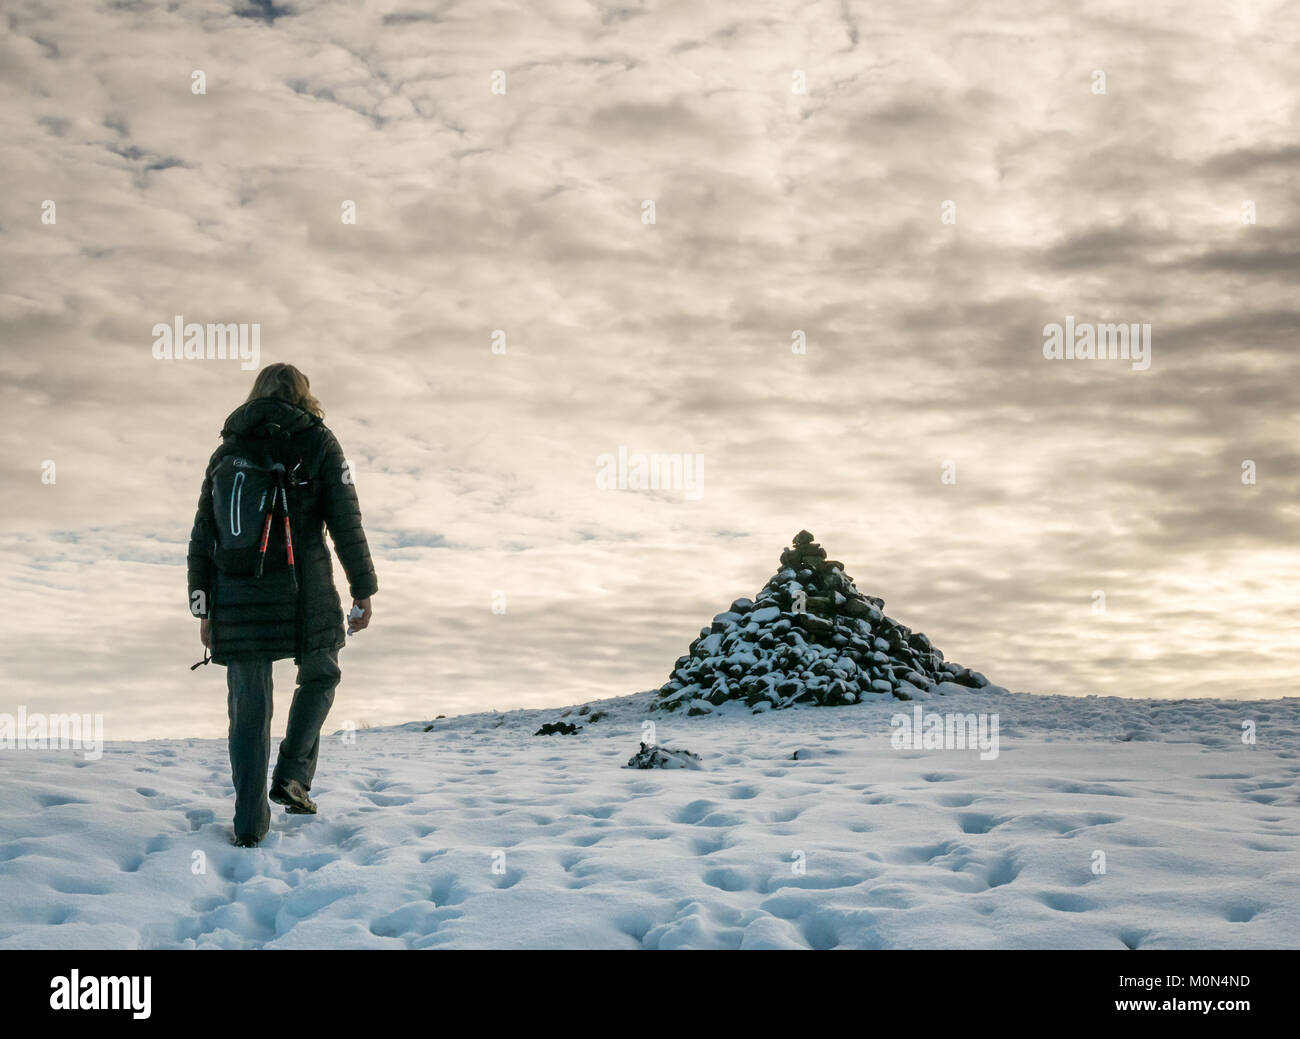 woman-walking-in-snow-uphill-on-footpath